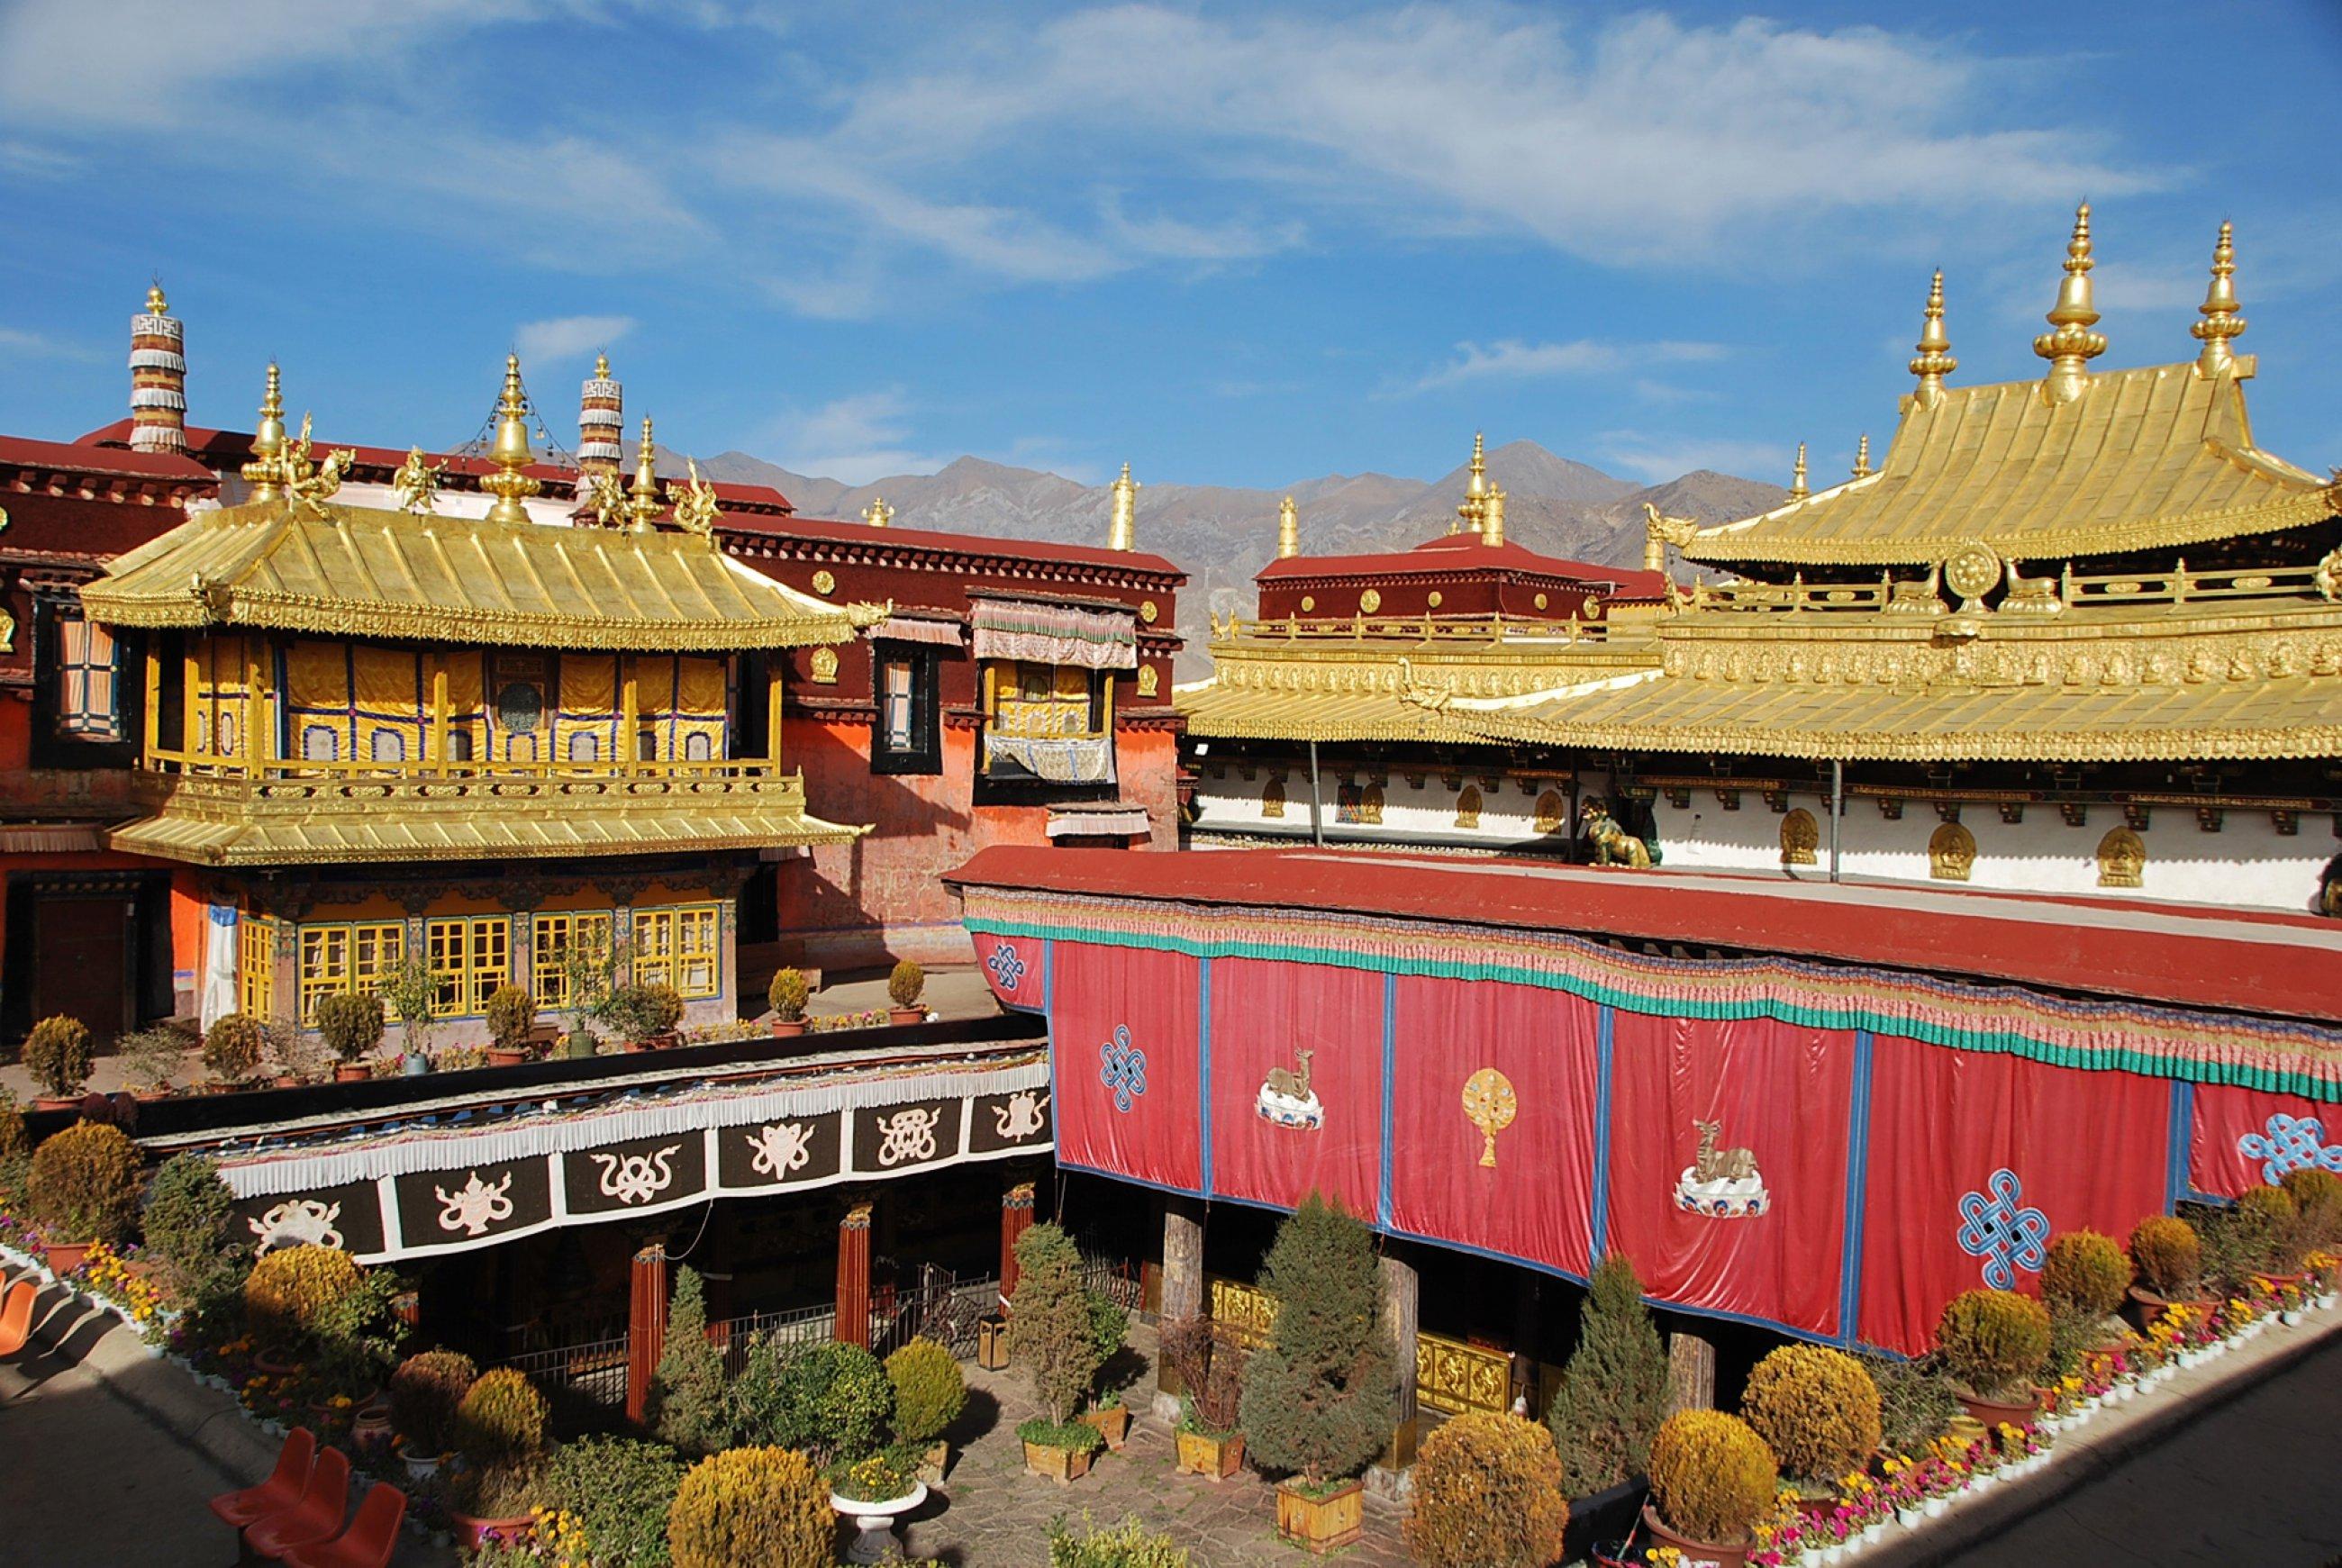 https://bubo.sk/uploads/galleries/16269/tibet-lhasa-ctni-11-2014-mirka-sulka-128-.jpg